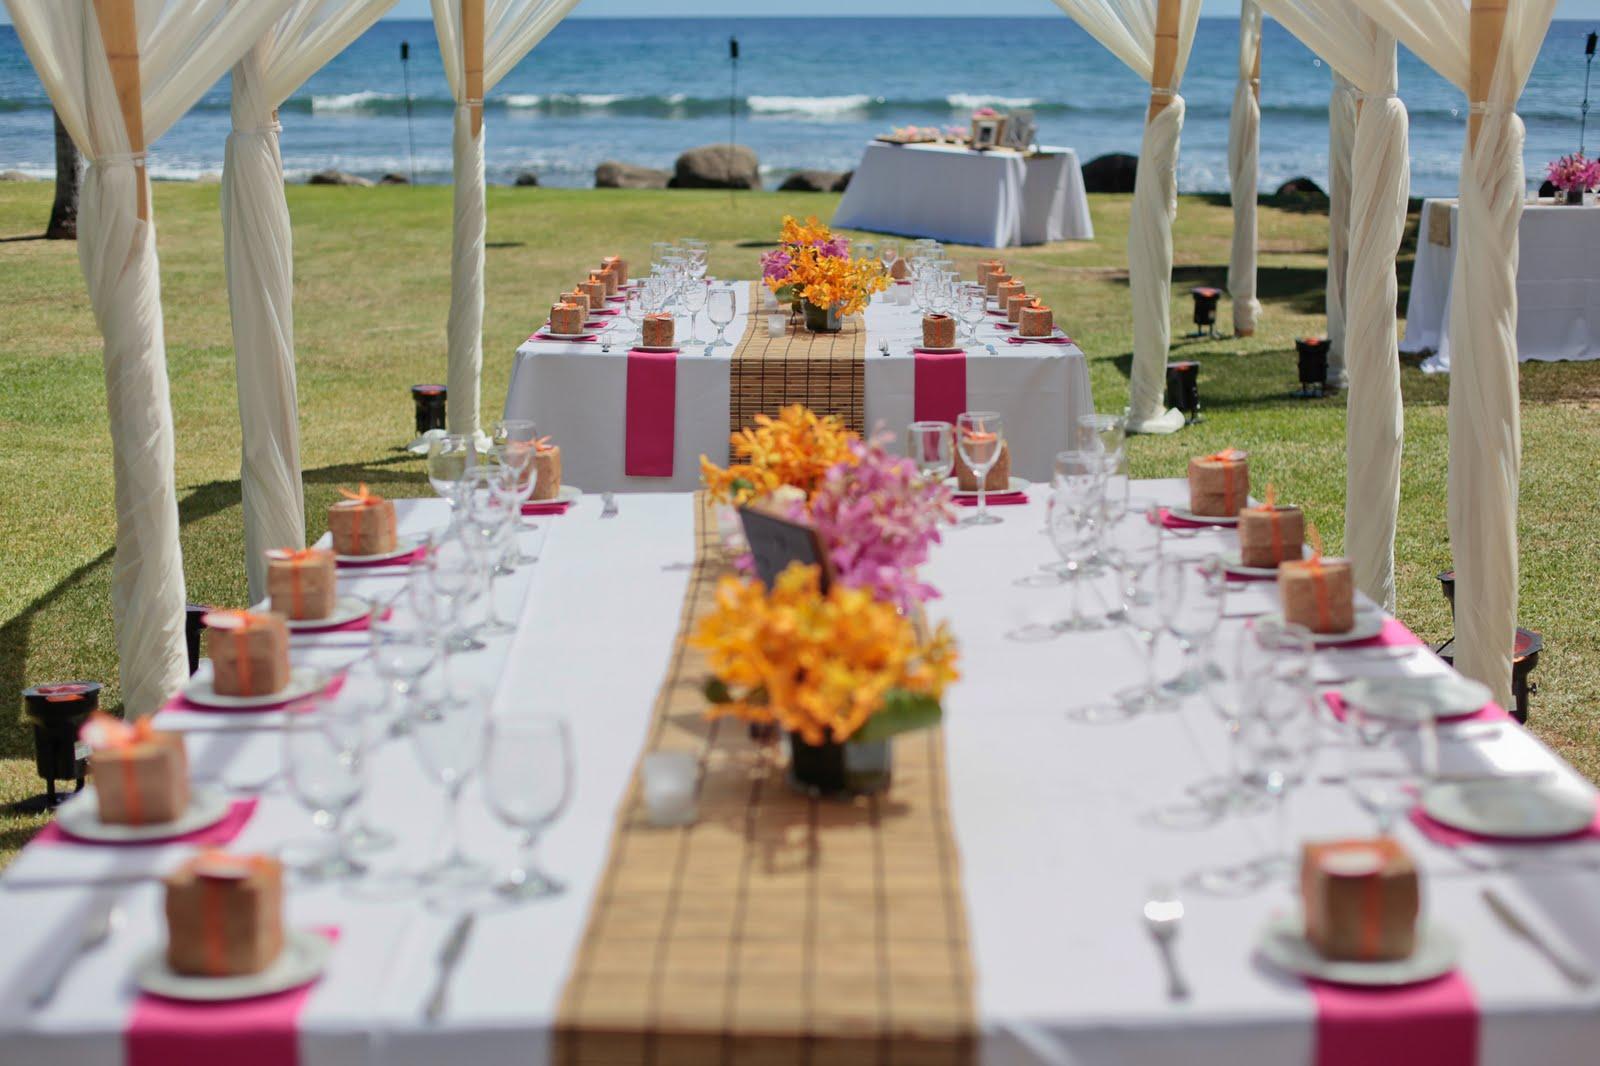 Beach wedding setup pictures 21 Most Romantic Beach Wedding Destinations